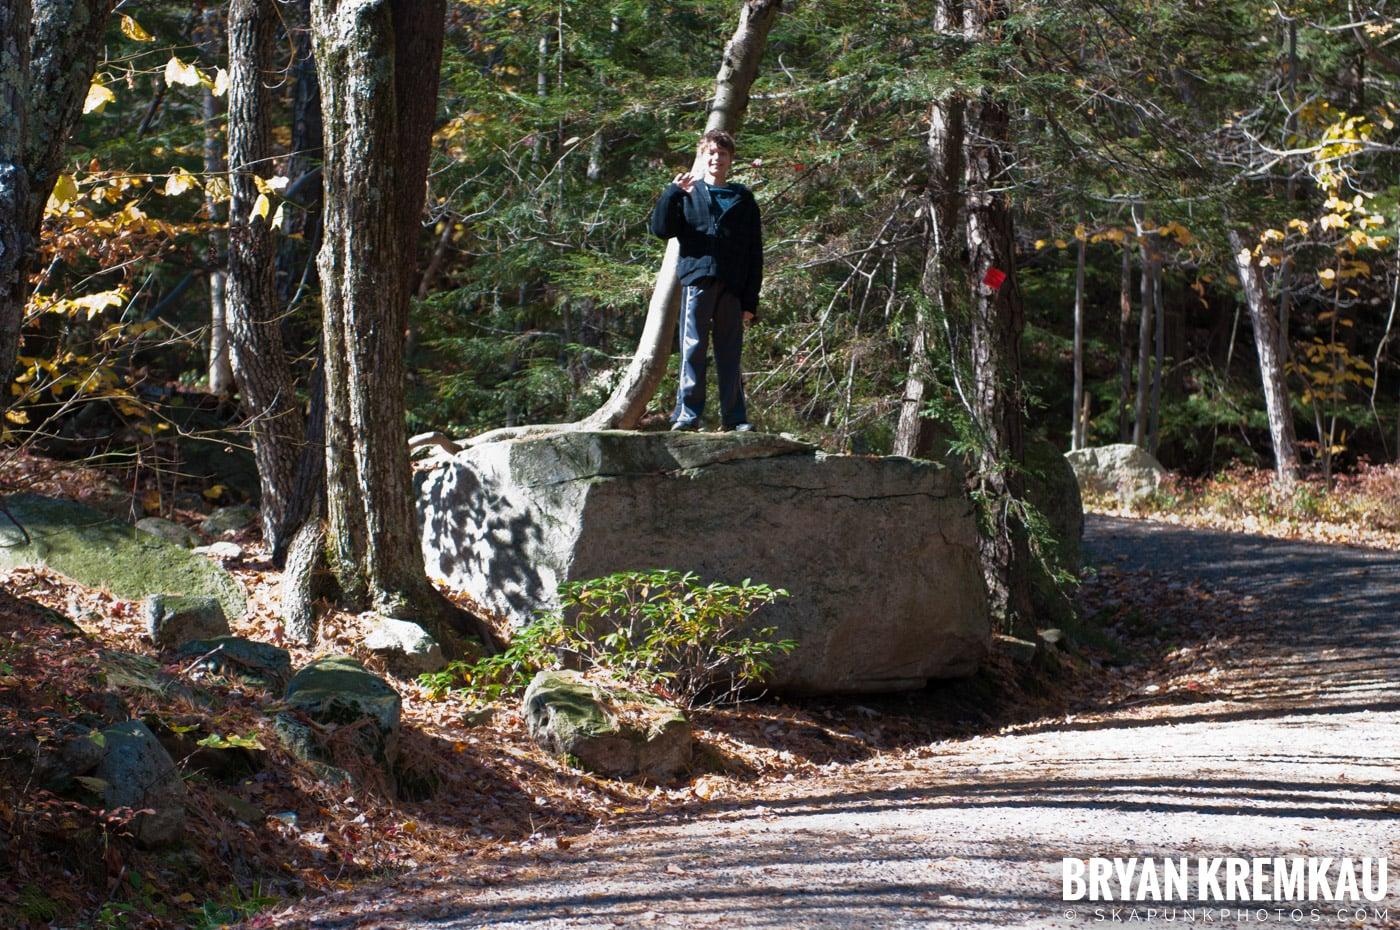 Minnewaska State Park Preserve @ Wawarsing, New York - 10.22.11 (5)